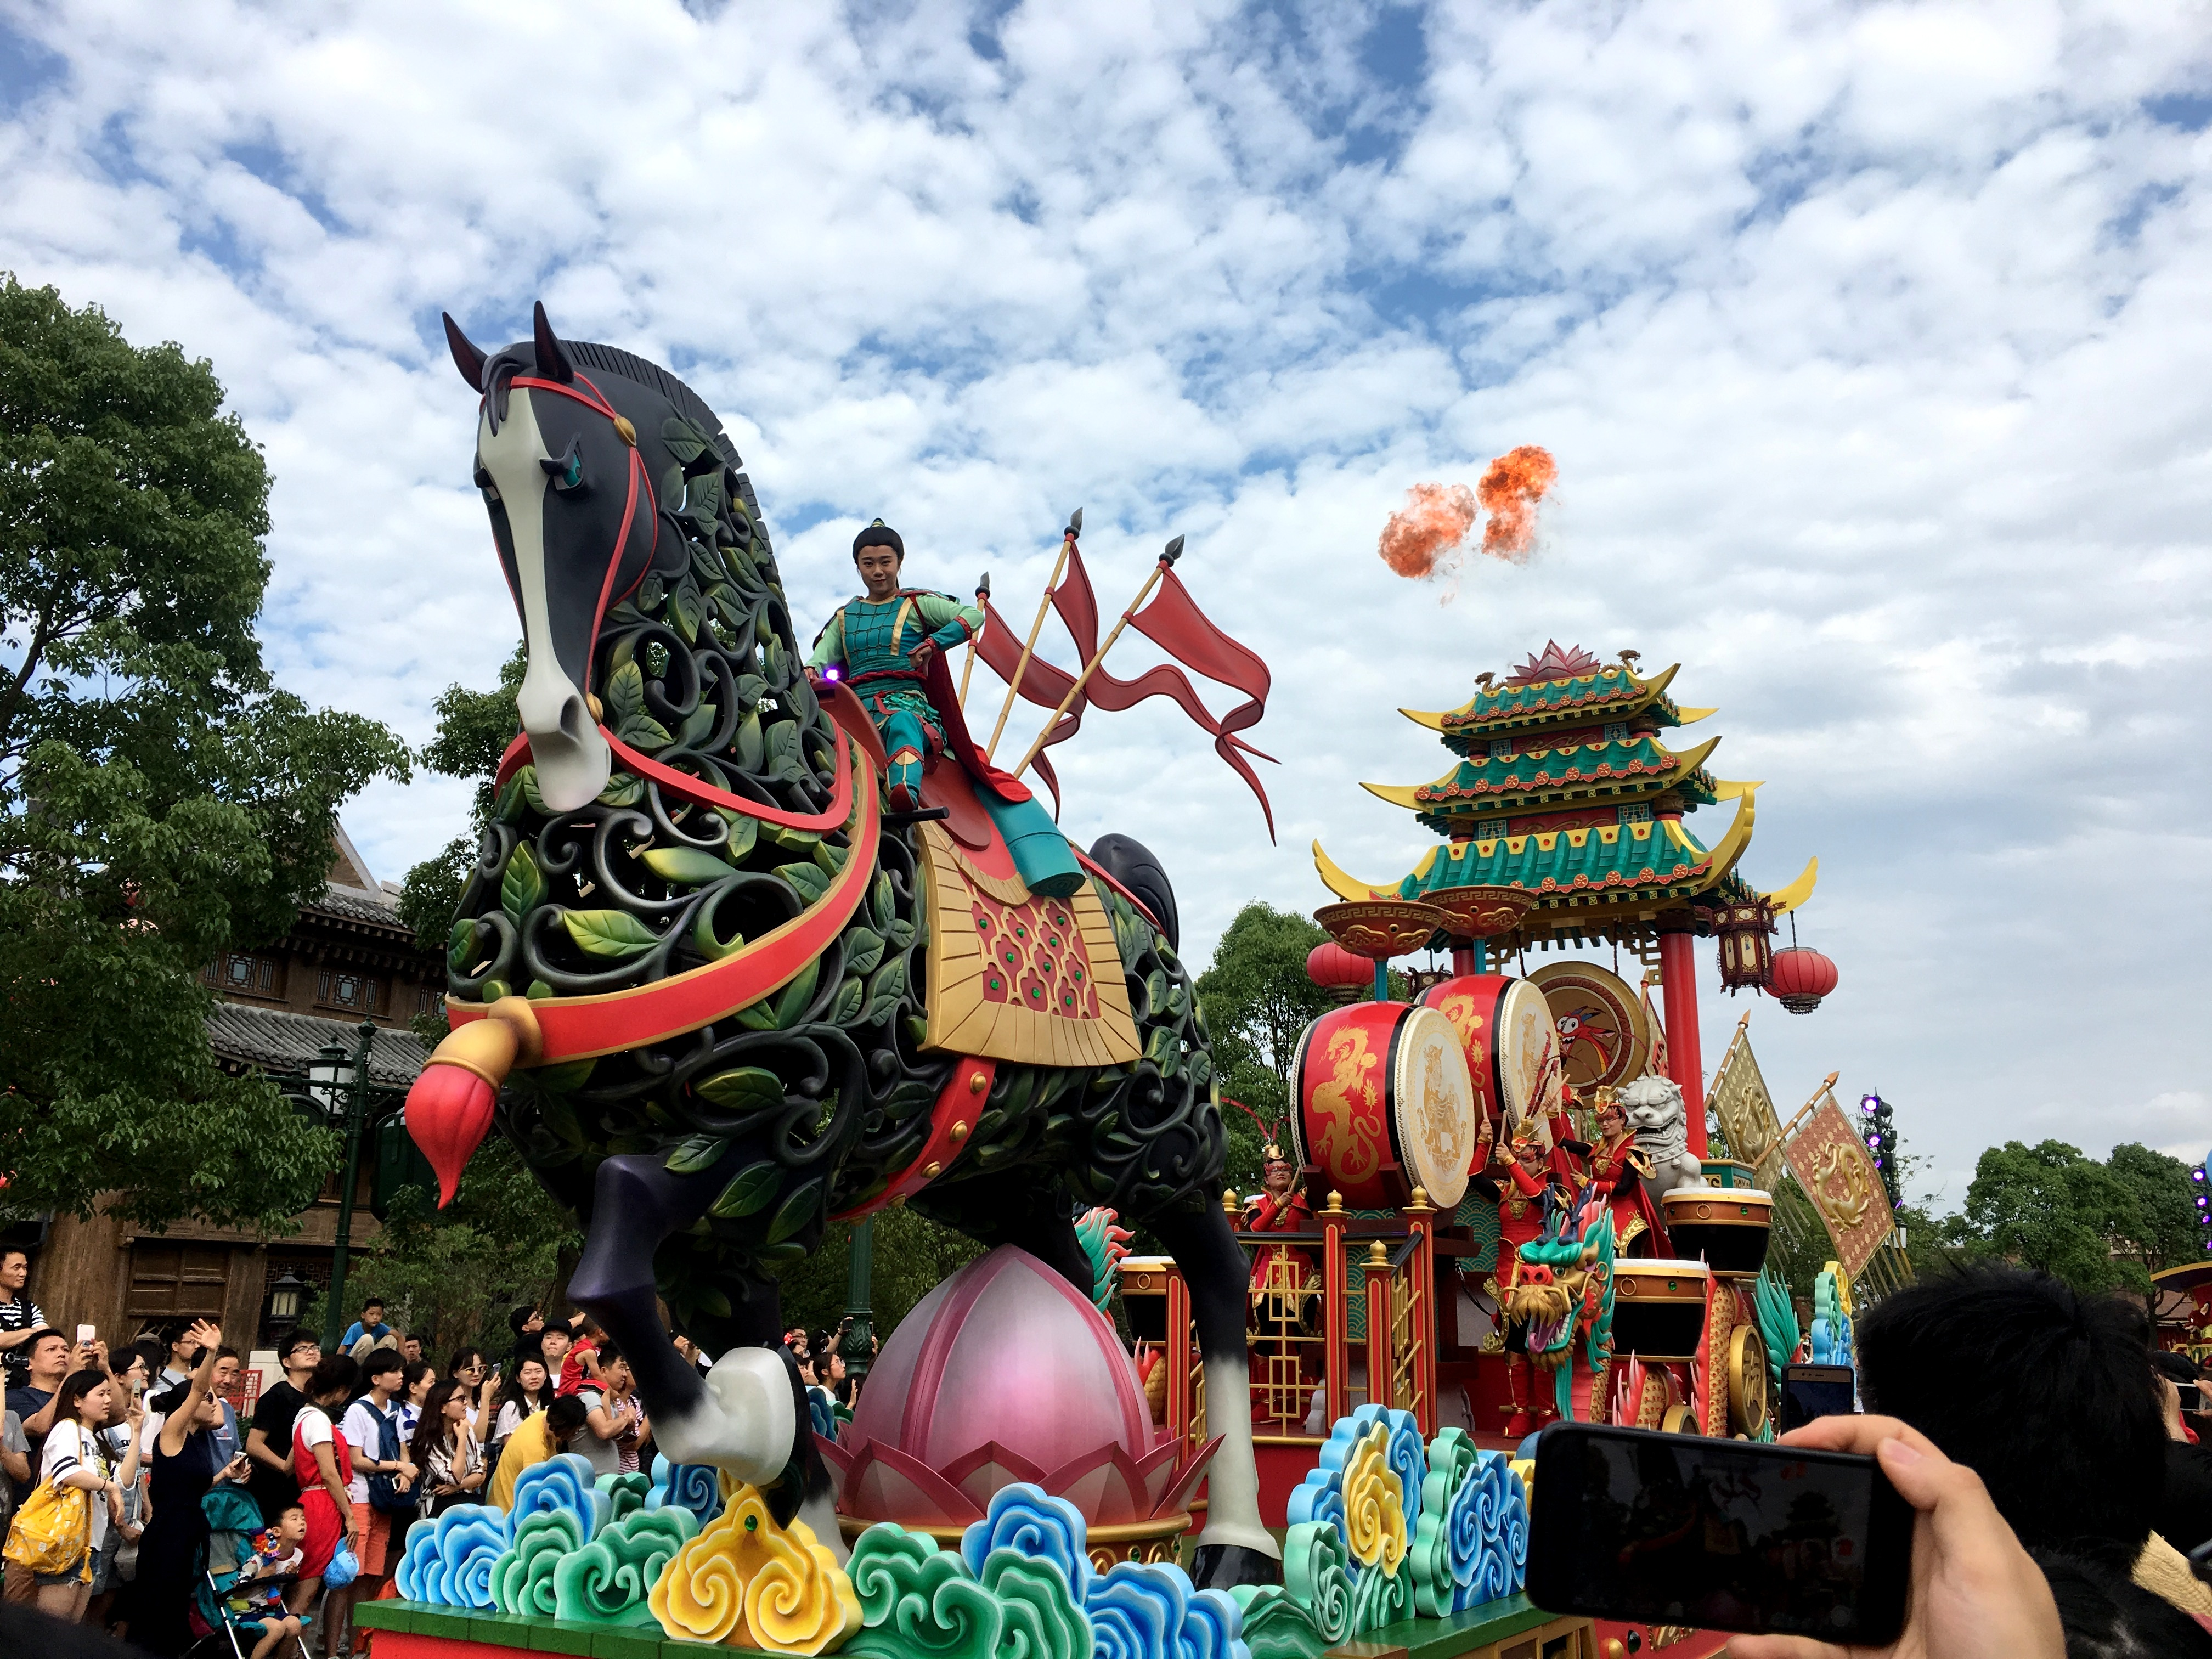 shanghai-disneyland-mickeys-storybook-express-parade-5